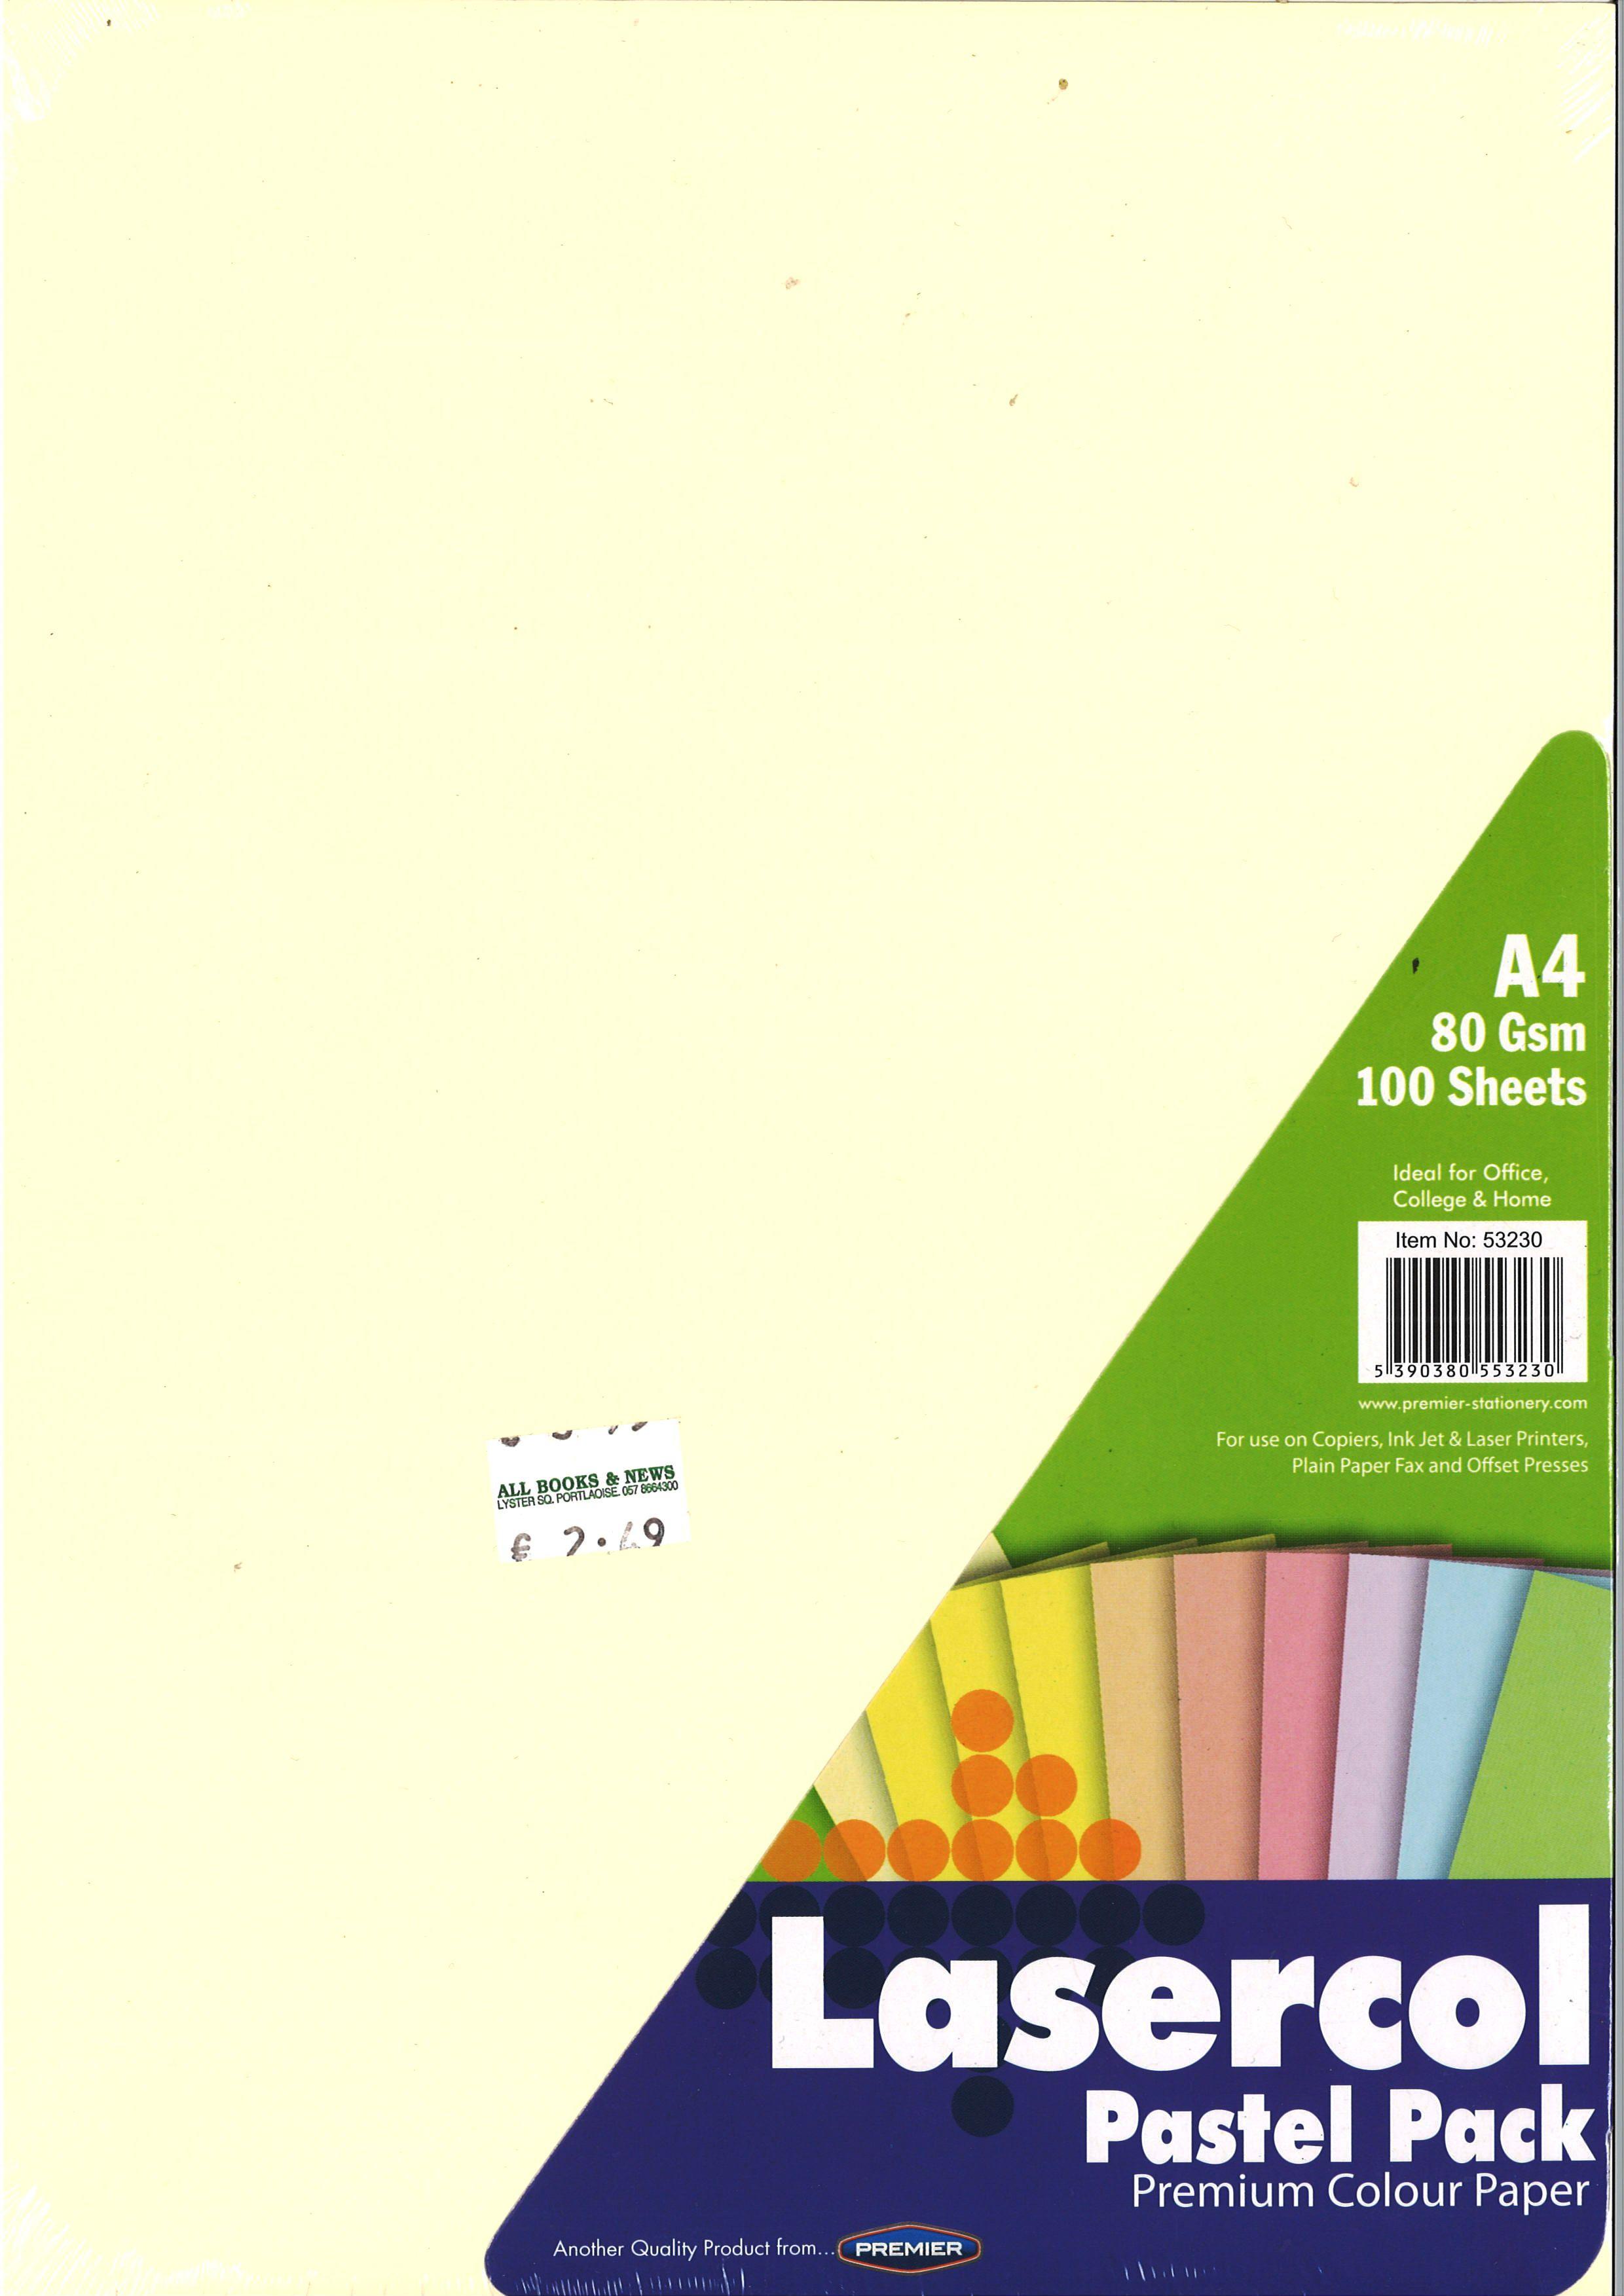 A4 COLOURED PAPER /& CARD MULTI USE CARDMAKING PRINTER COPIER 80gsm /& 160gsm